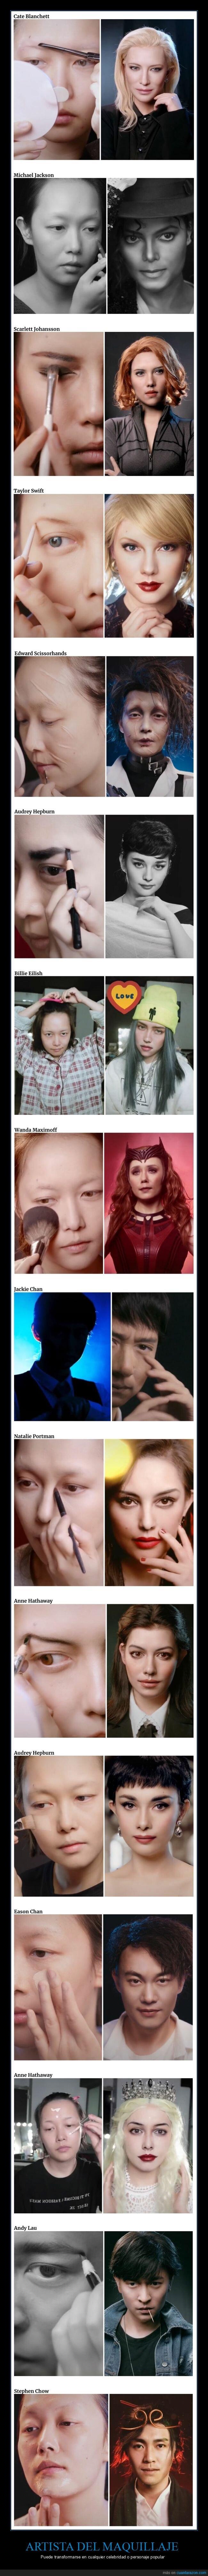 famosos,maquillaje,transformaciones